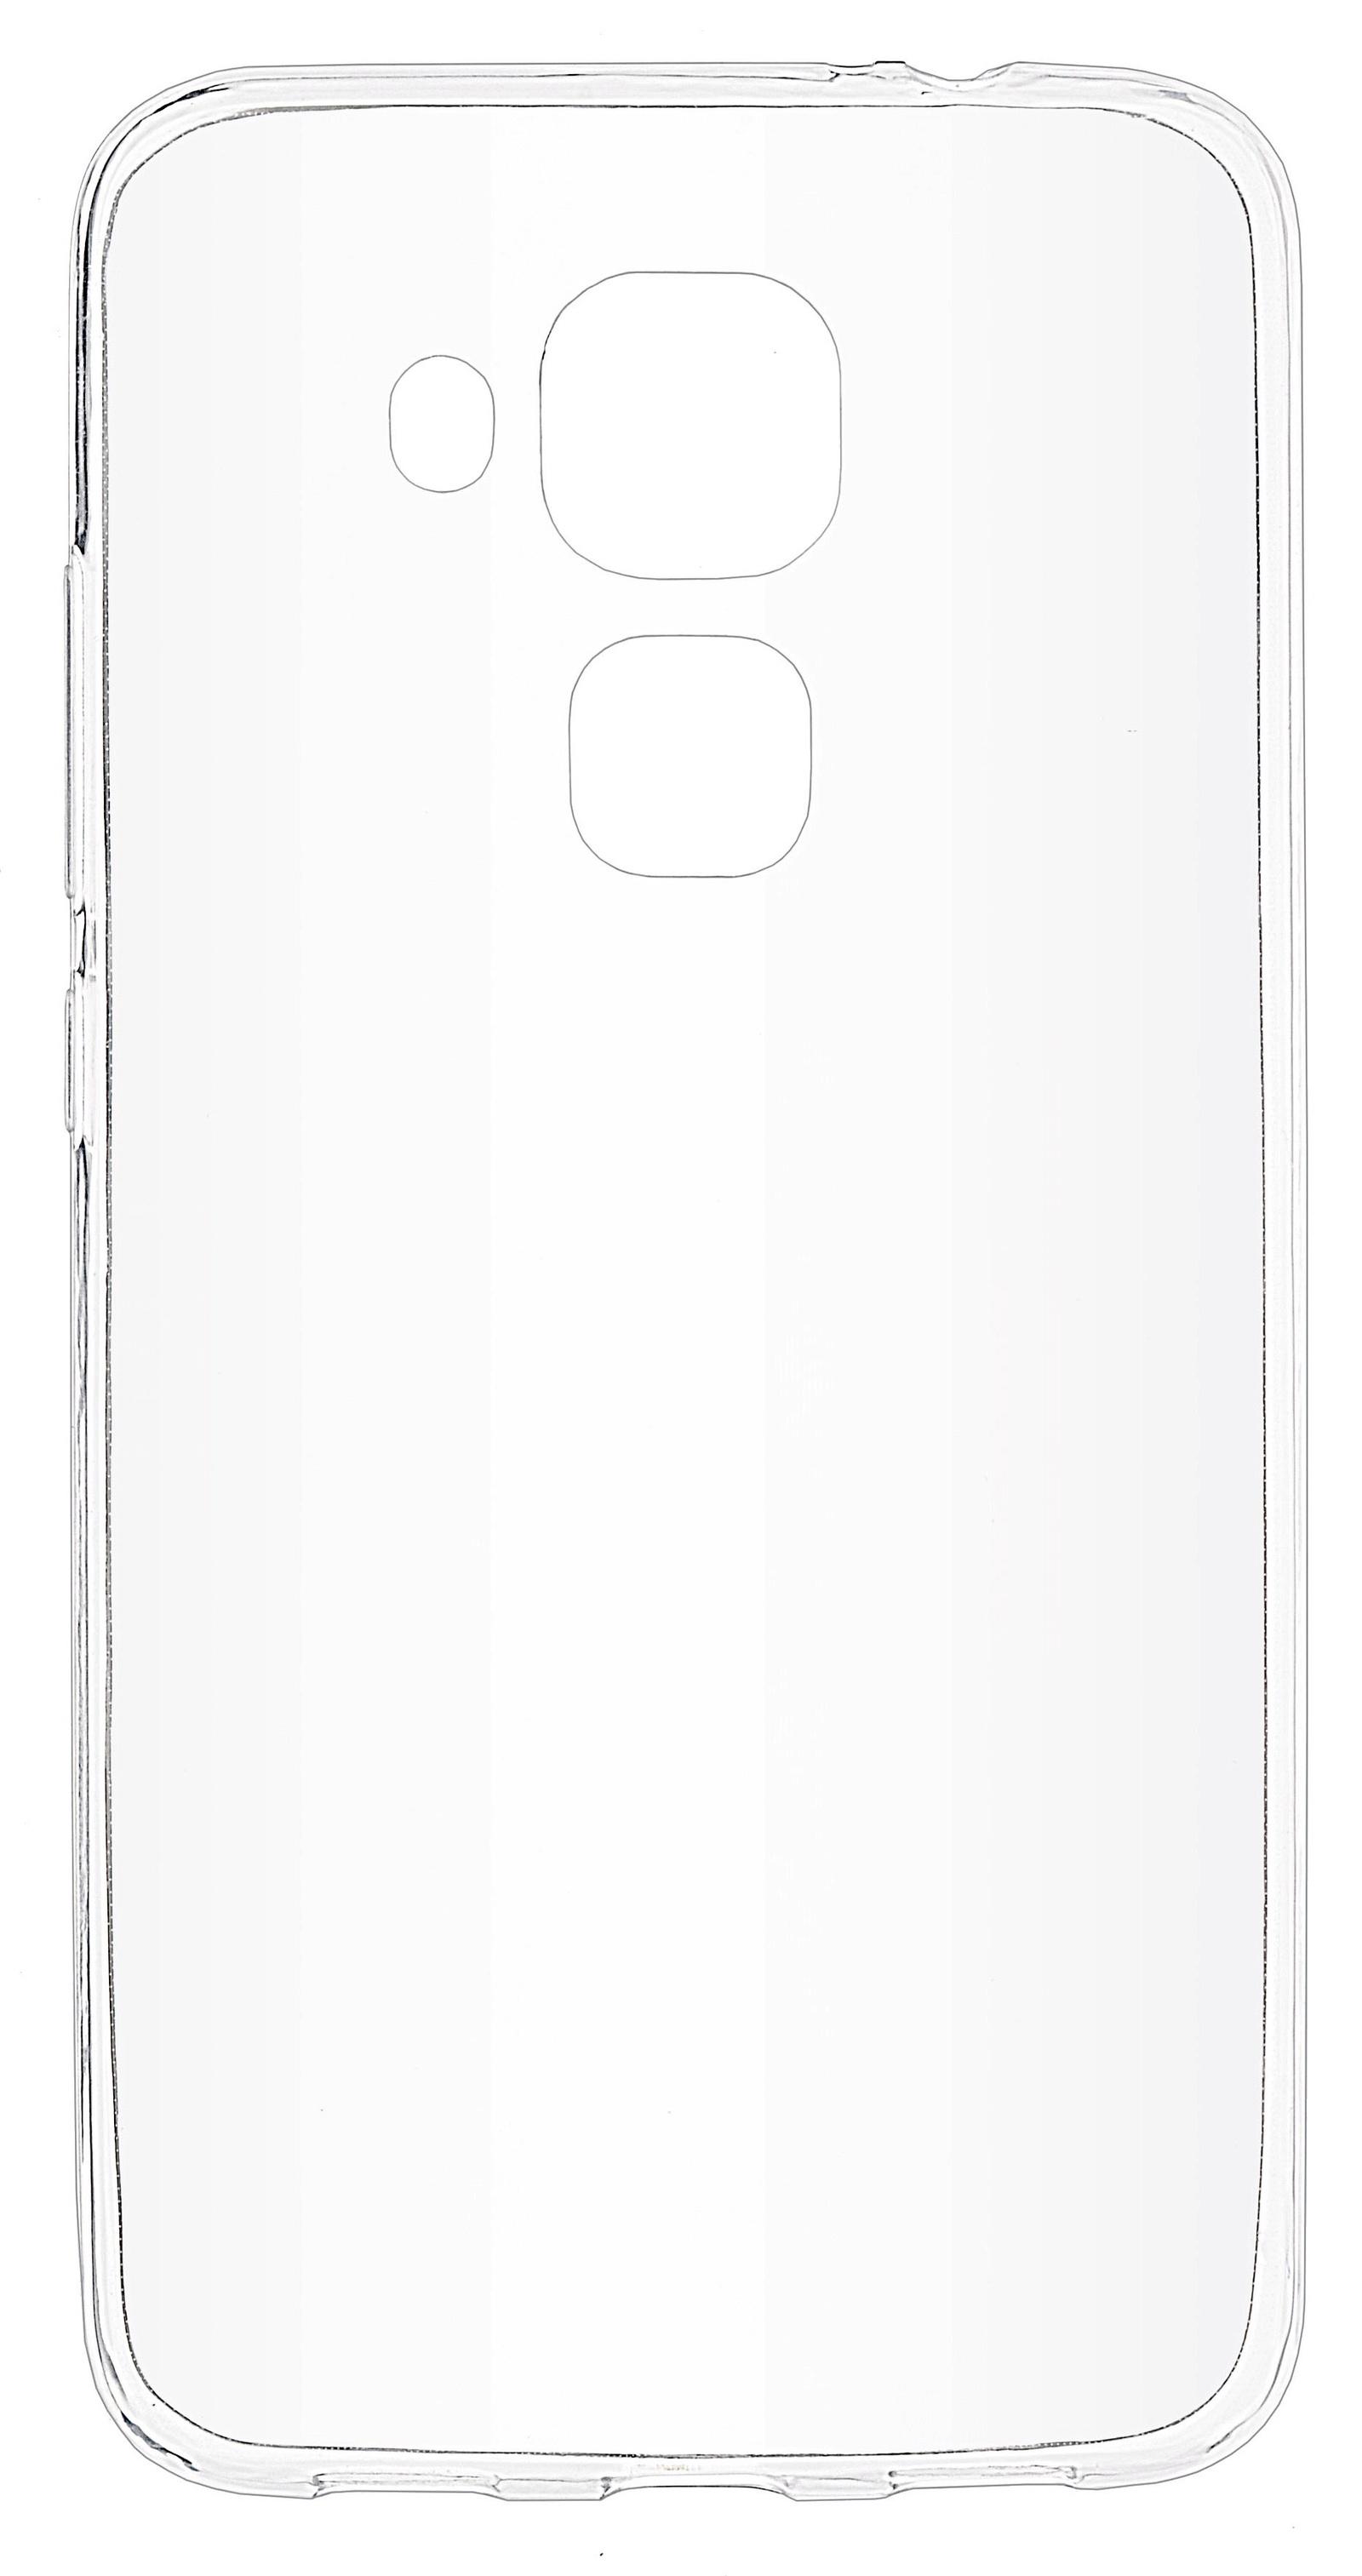 Чехол для сотового телефона skinBOX Slim Silicone, 4630042524668, прозрачный цены онлайн